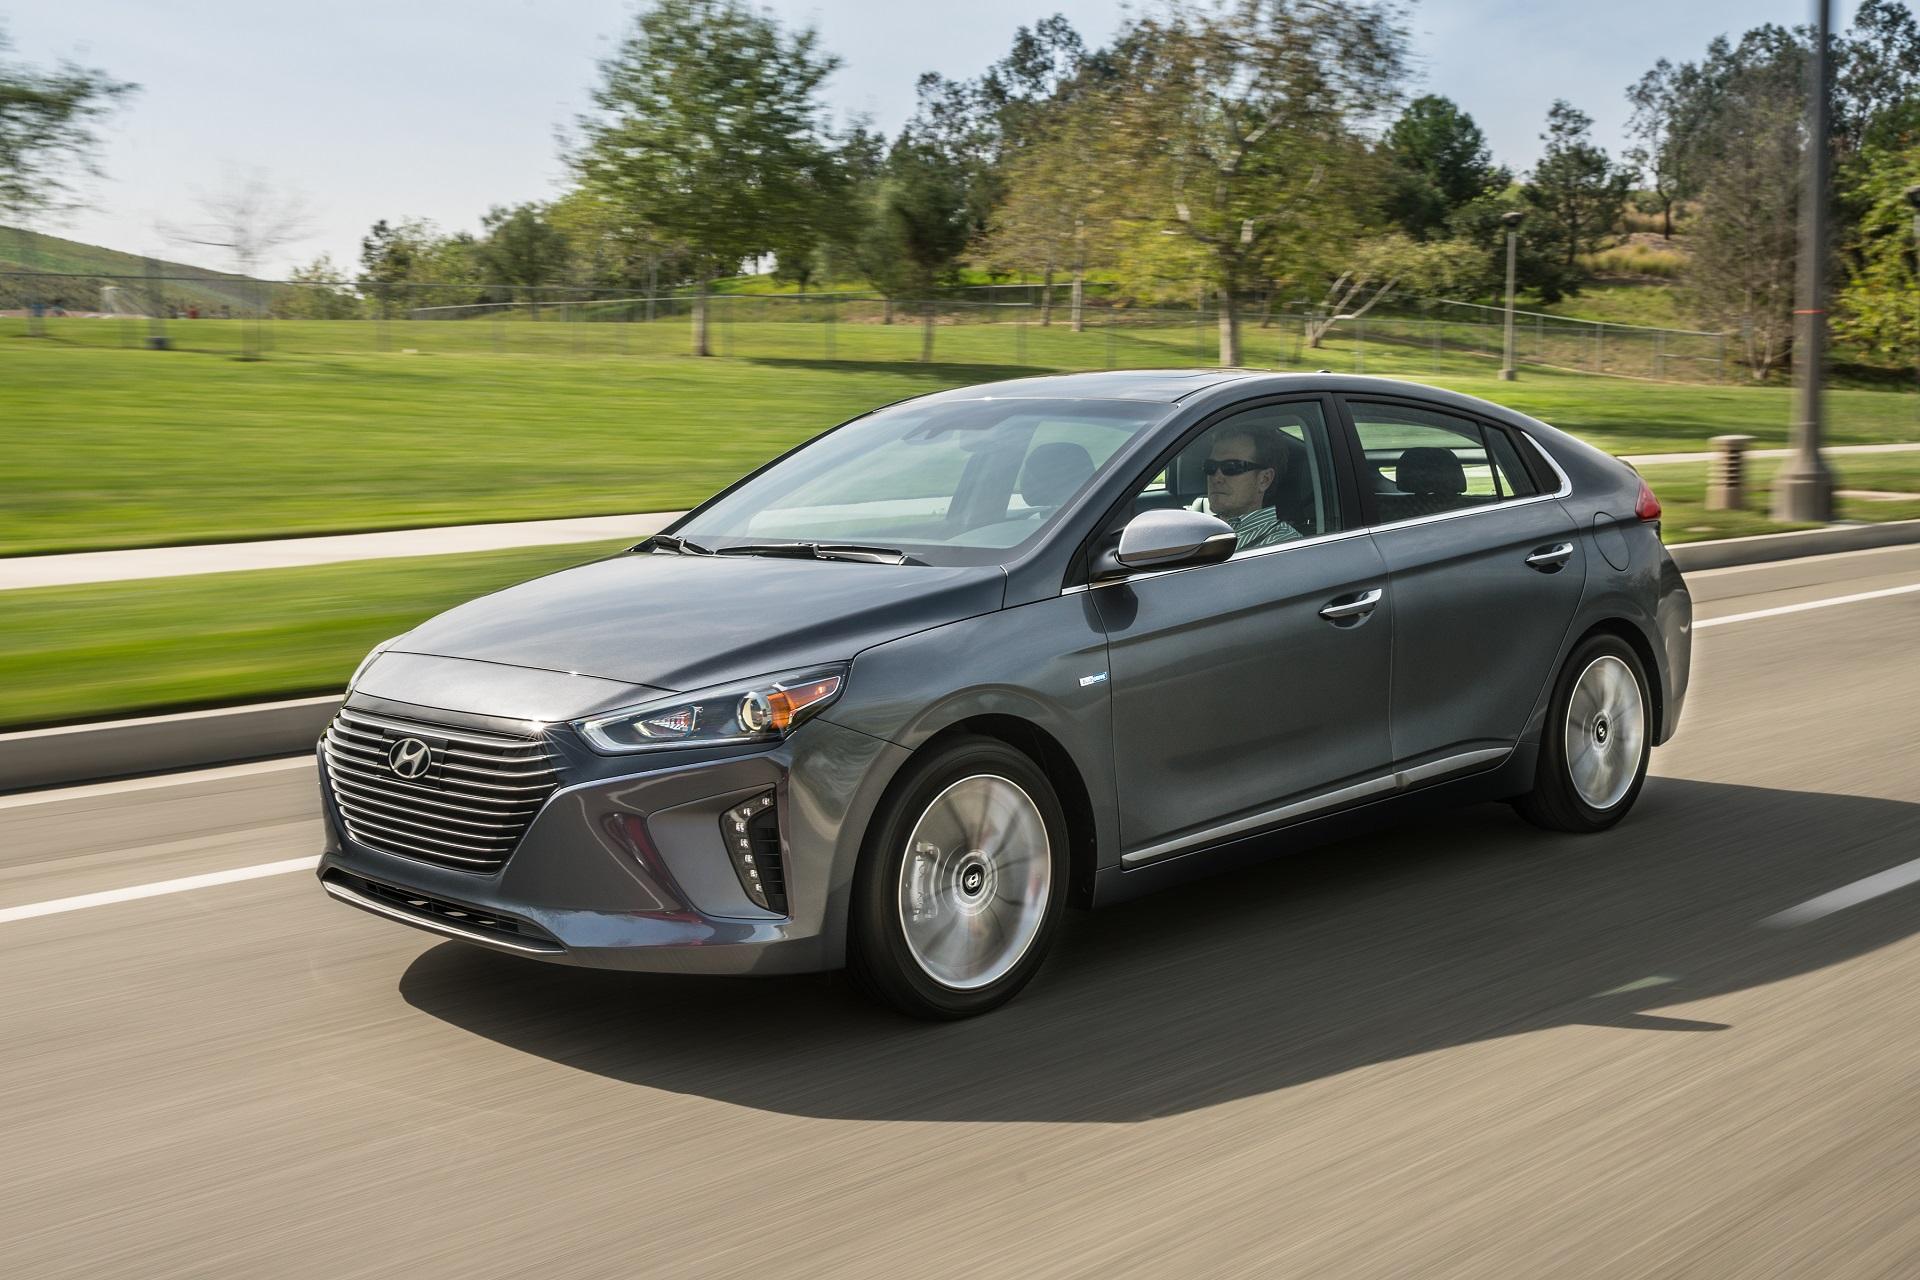 Hyundai lease deals june 2018